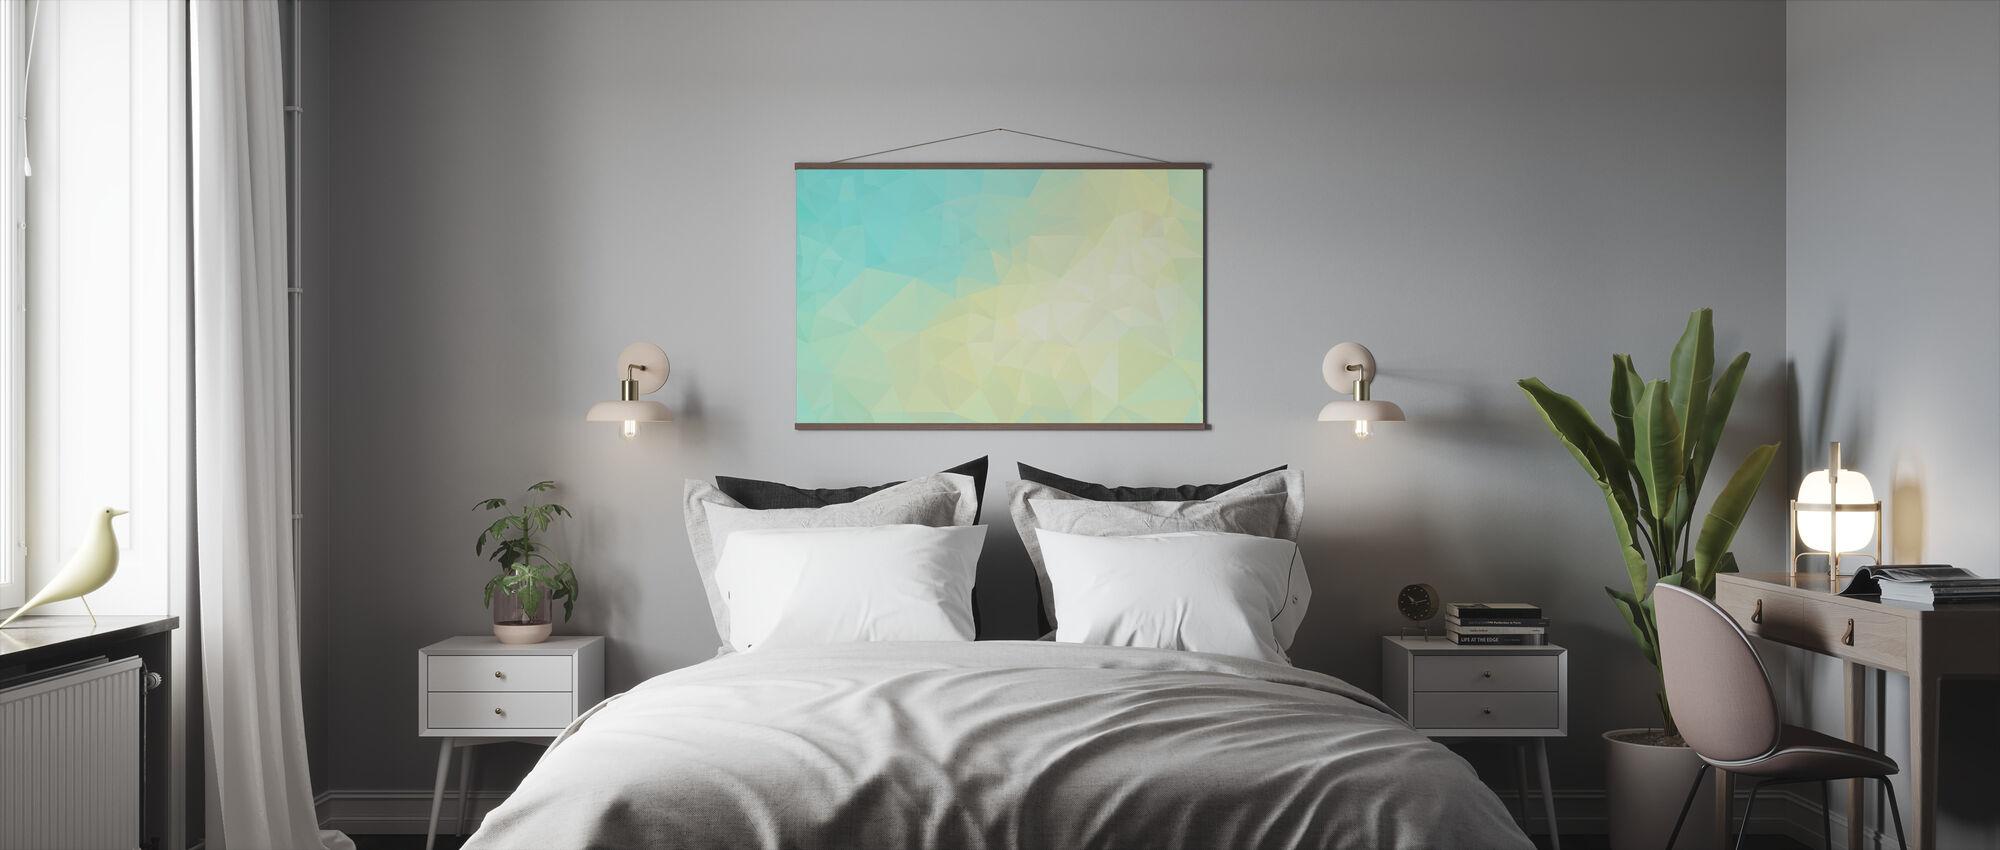 Geometric Sunshine - Poster - Bedroom